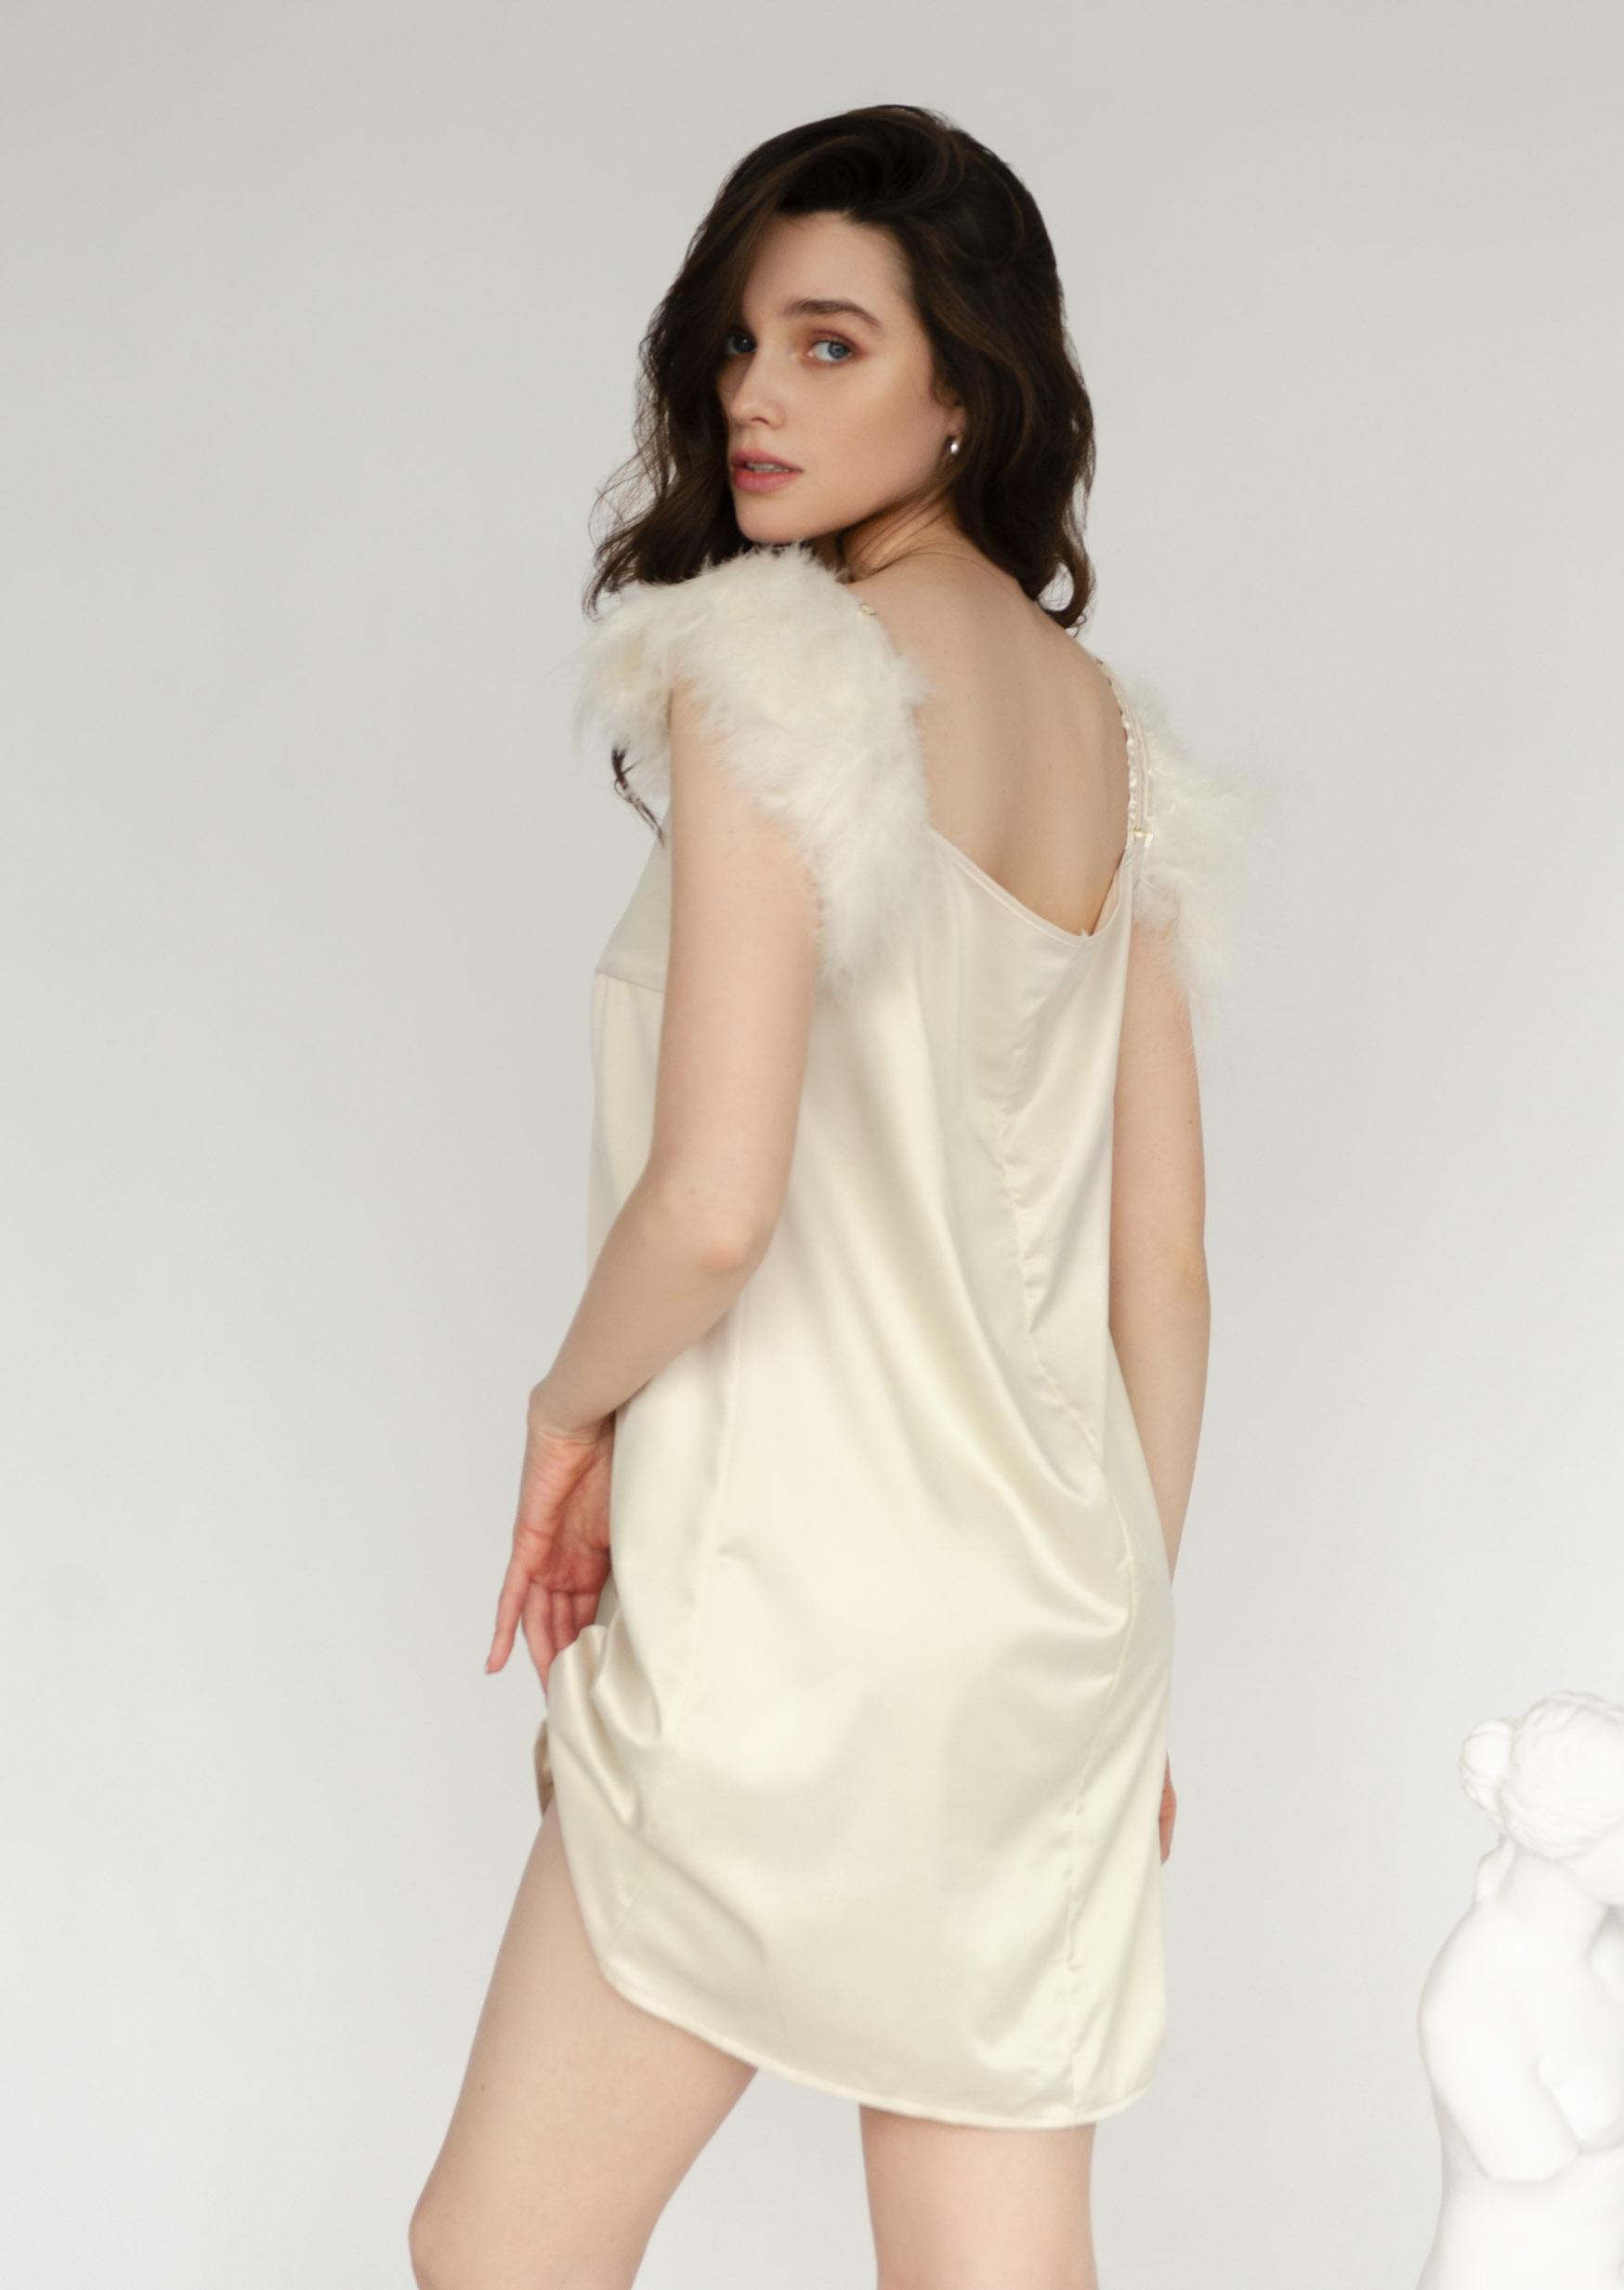 Angel slip dress satin cream romantic slip short classic dress